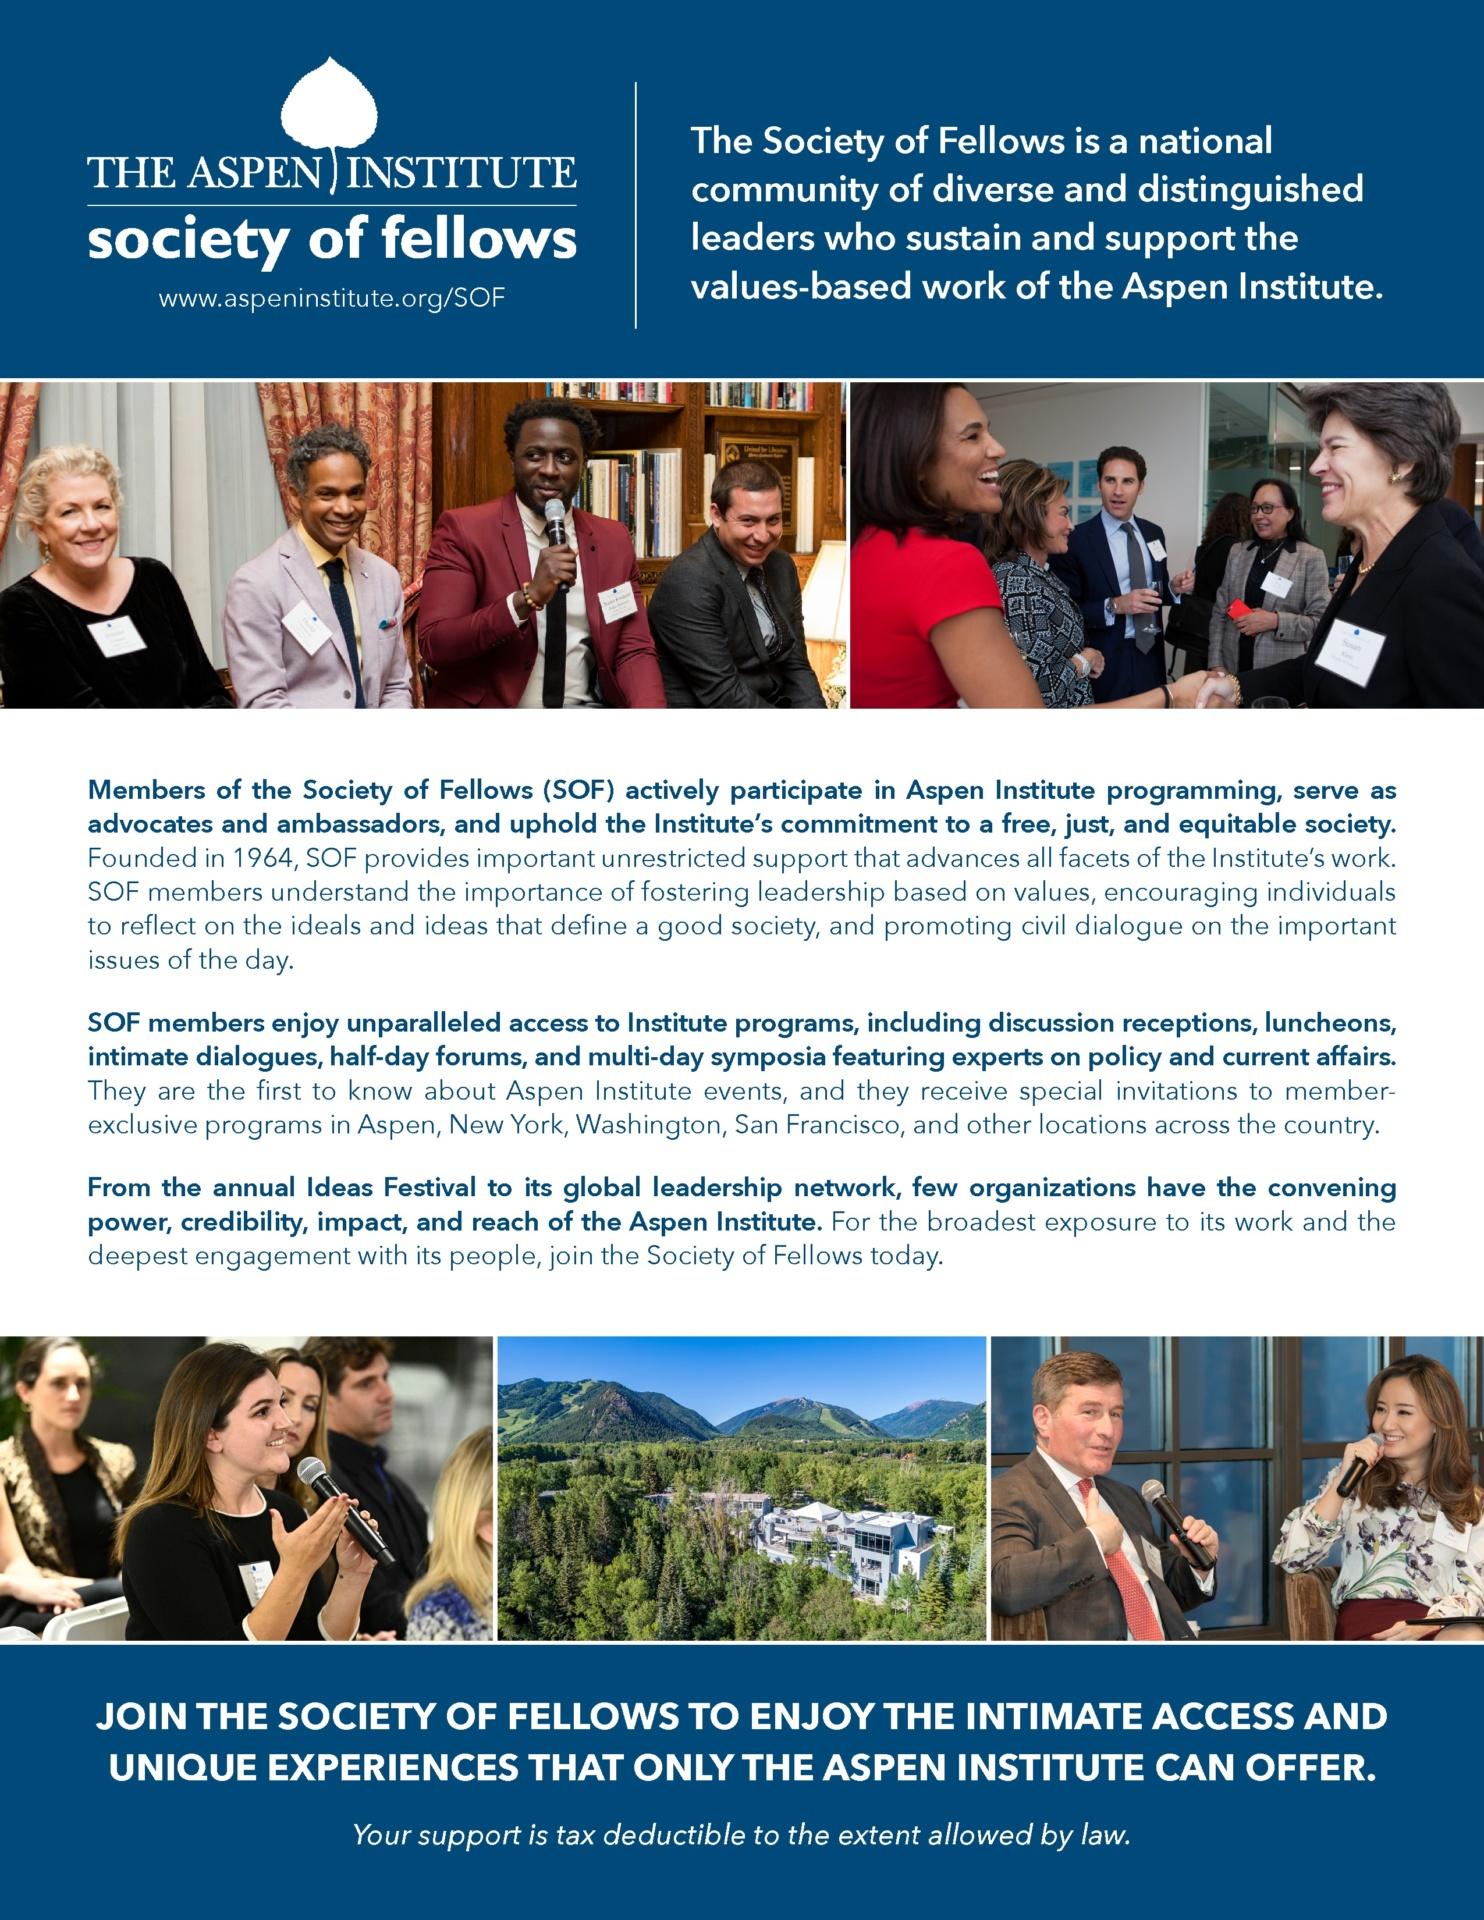 Membership Levels - The Aspen Institute